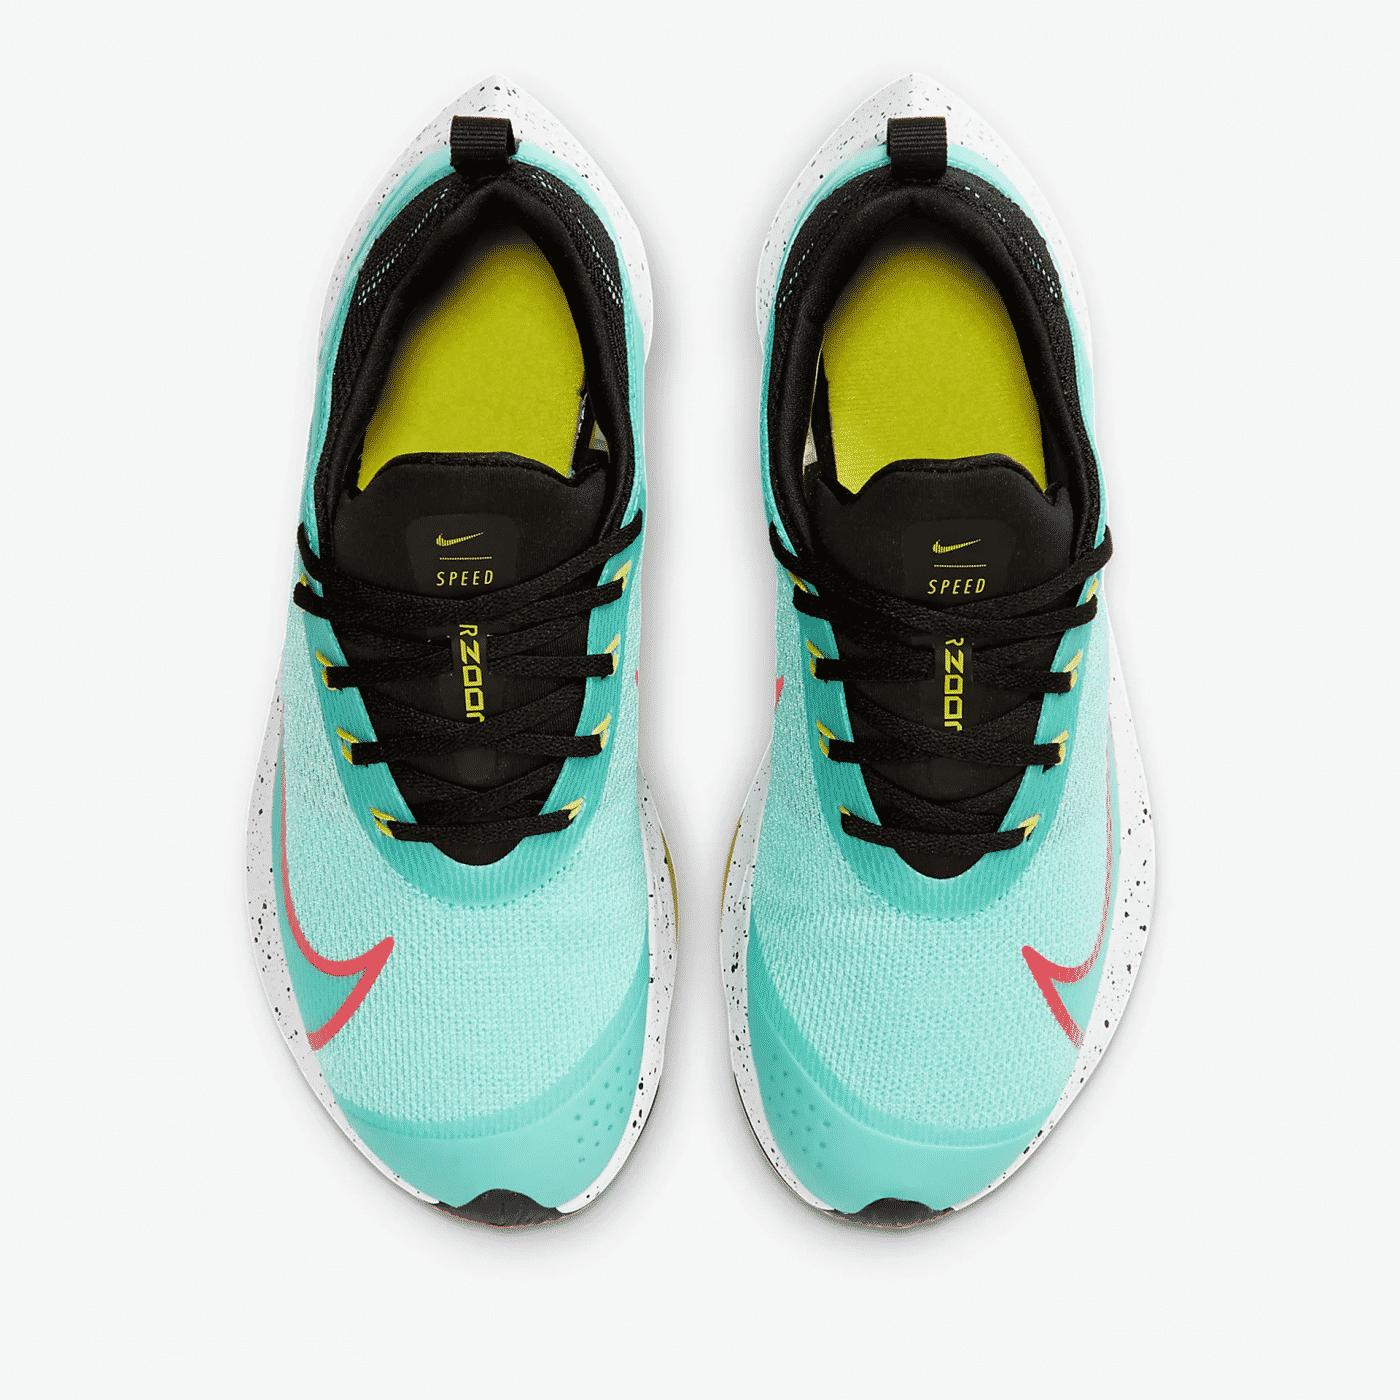 Nike Air Zoom Speed, la nouvelle chaussure de running pour